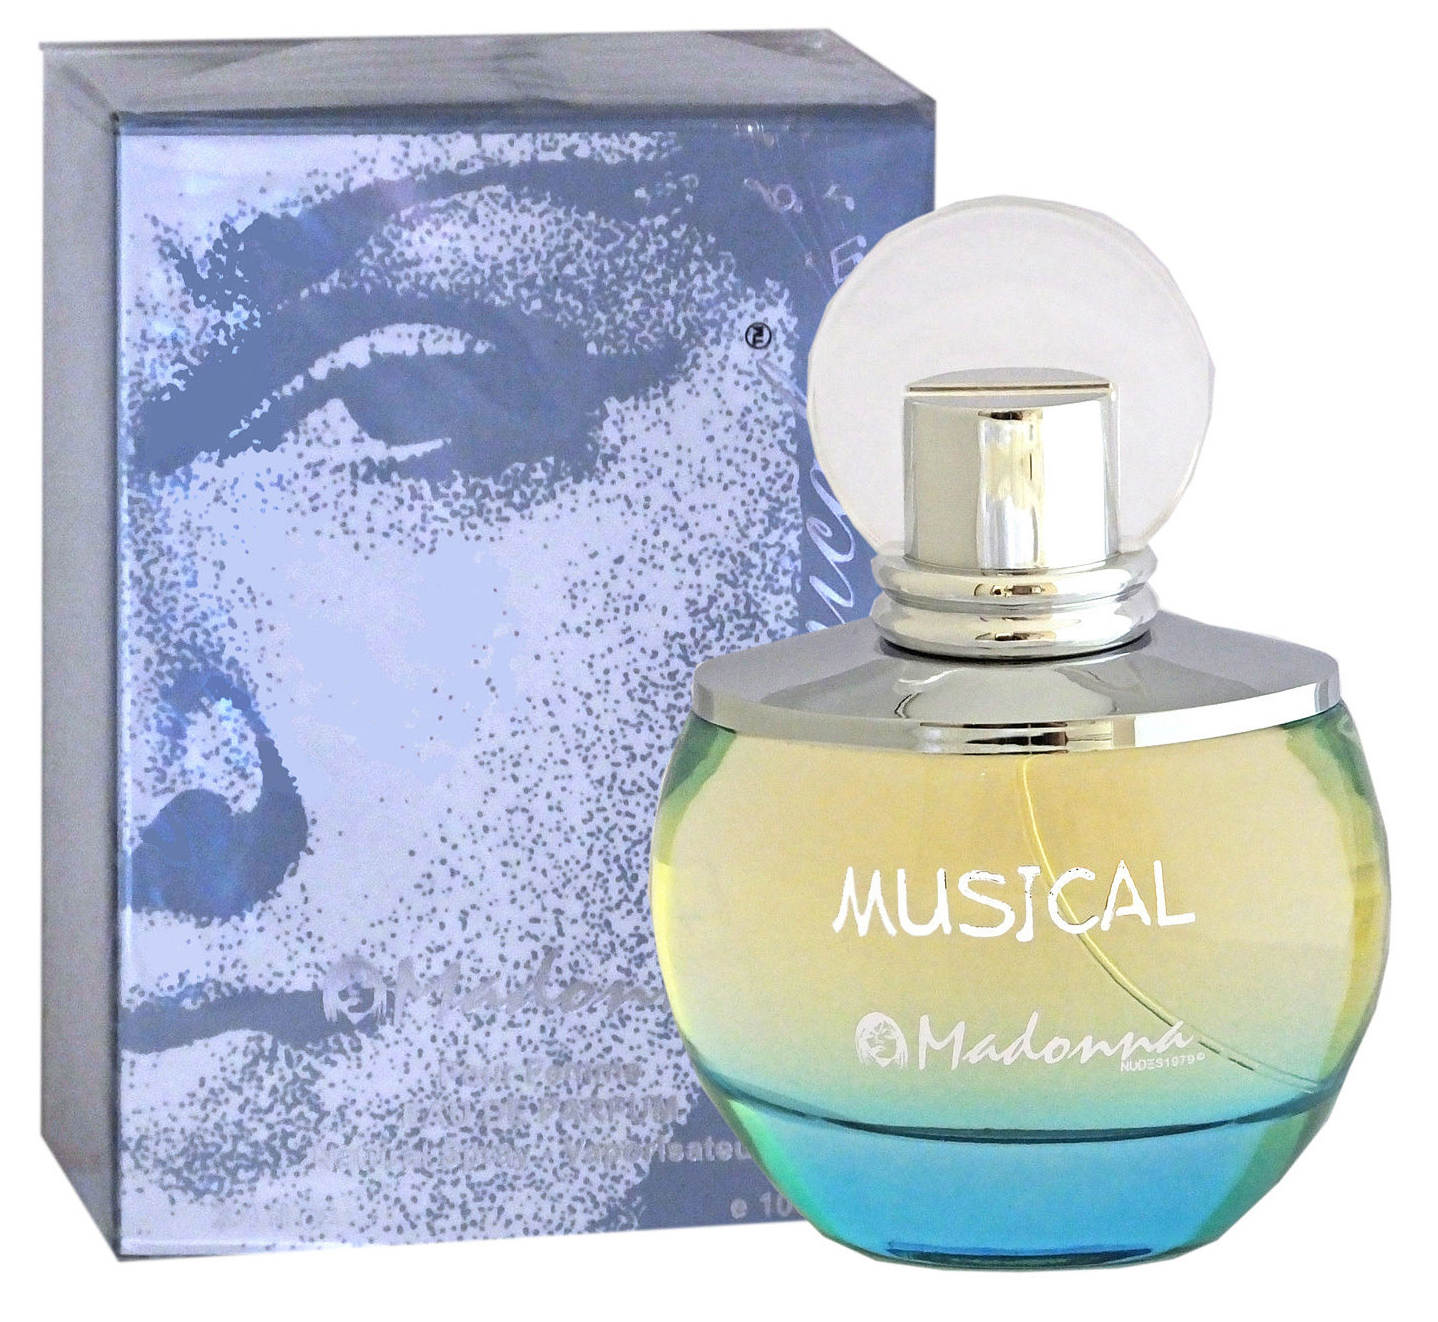 Madonna Musical EdP 100 ml